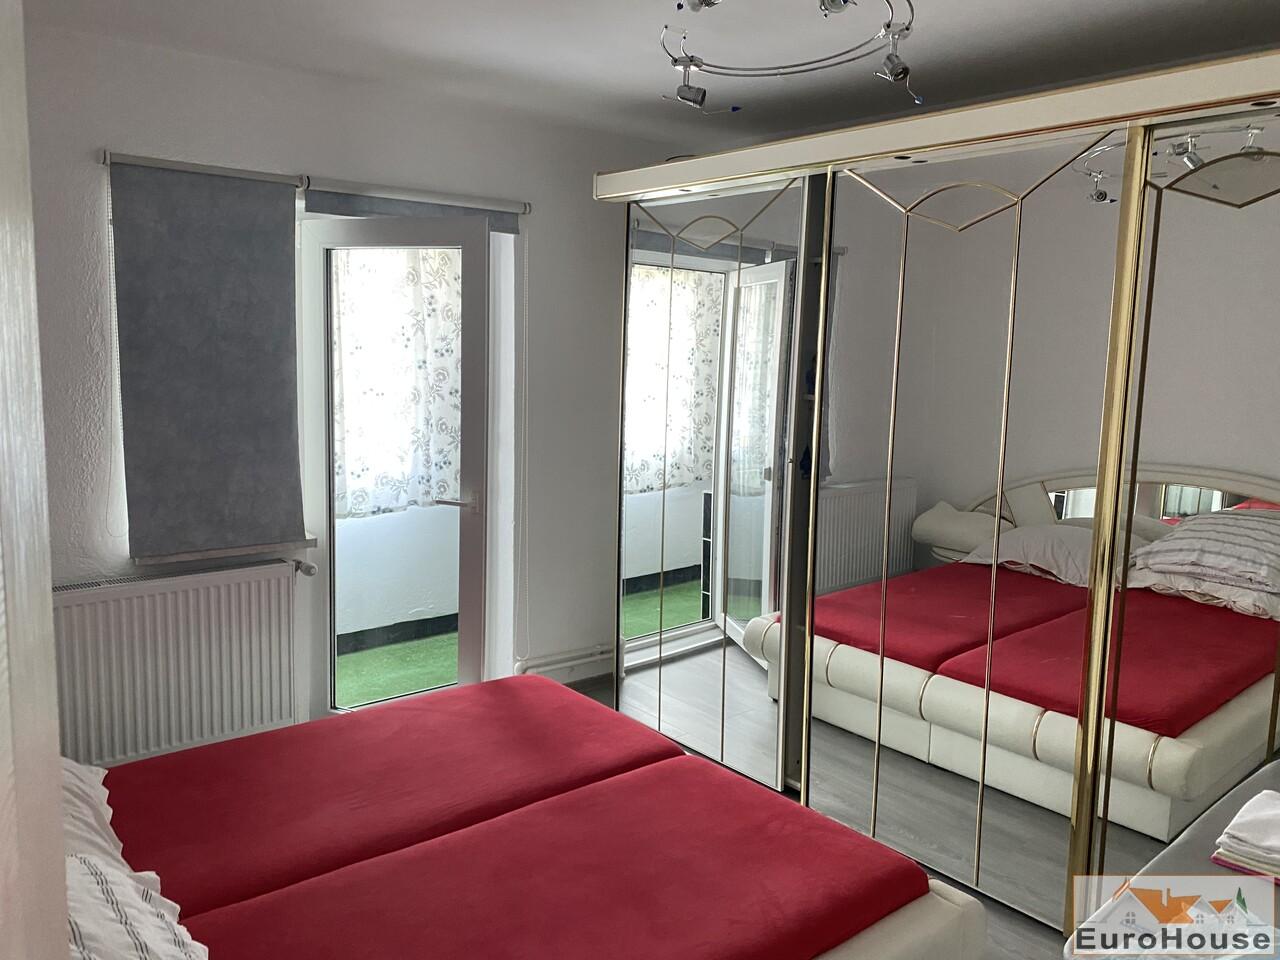 Apartament cu 3 camere de vanzare in Alba Iulia-35162-